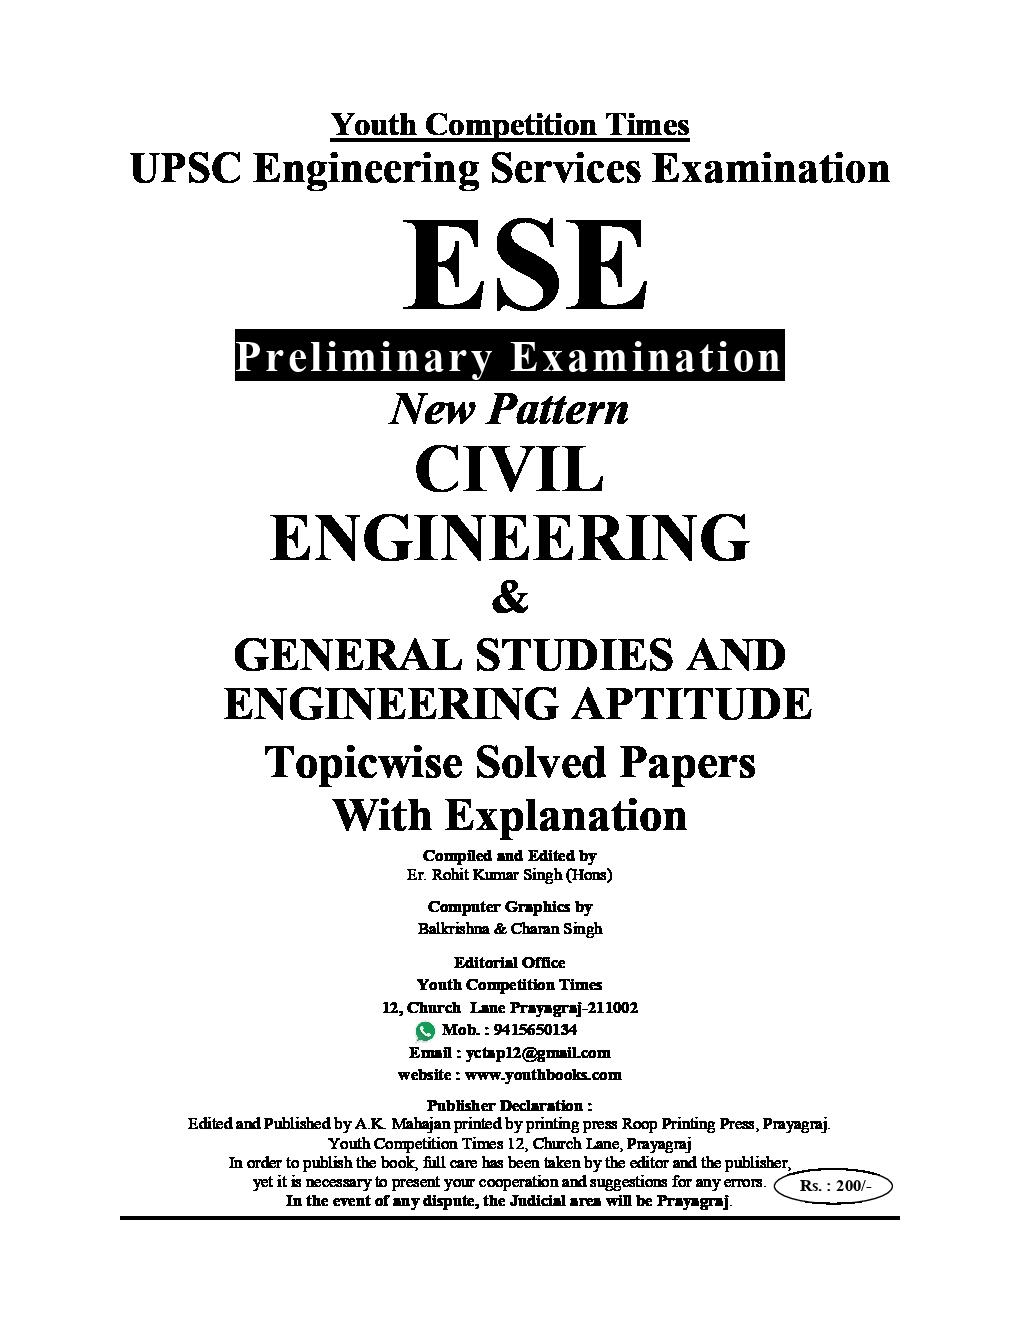 IES /ESE Prelims Exam Civil Engineering & General Studies And Engineering Apptitude Solved Papers  - Page 2